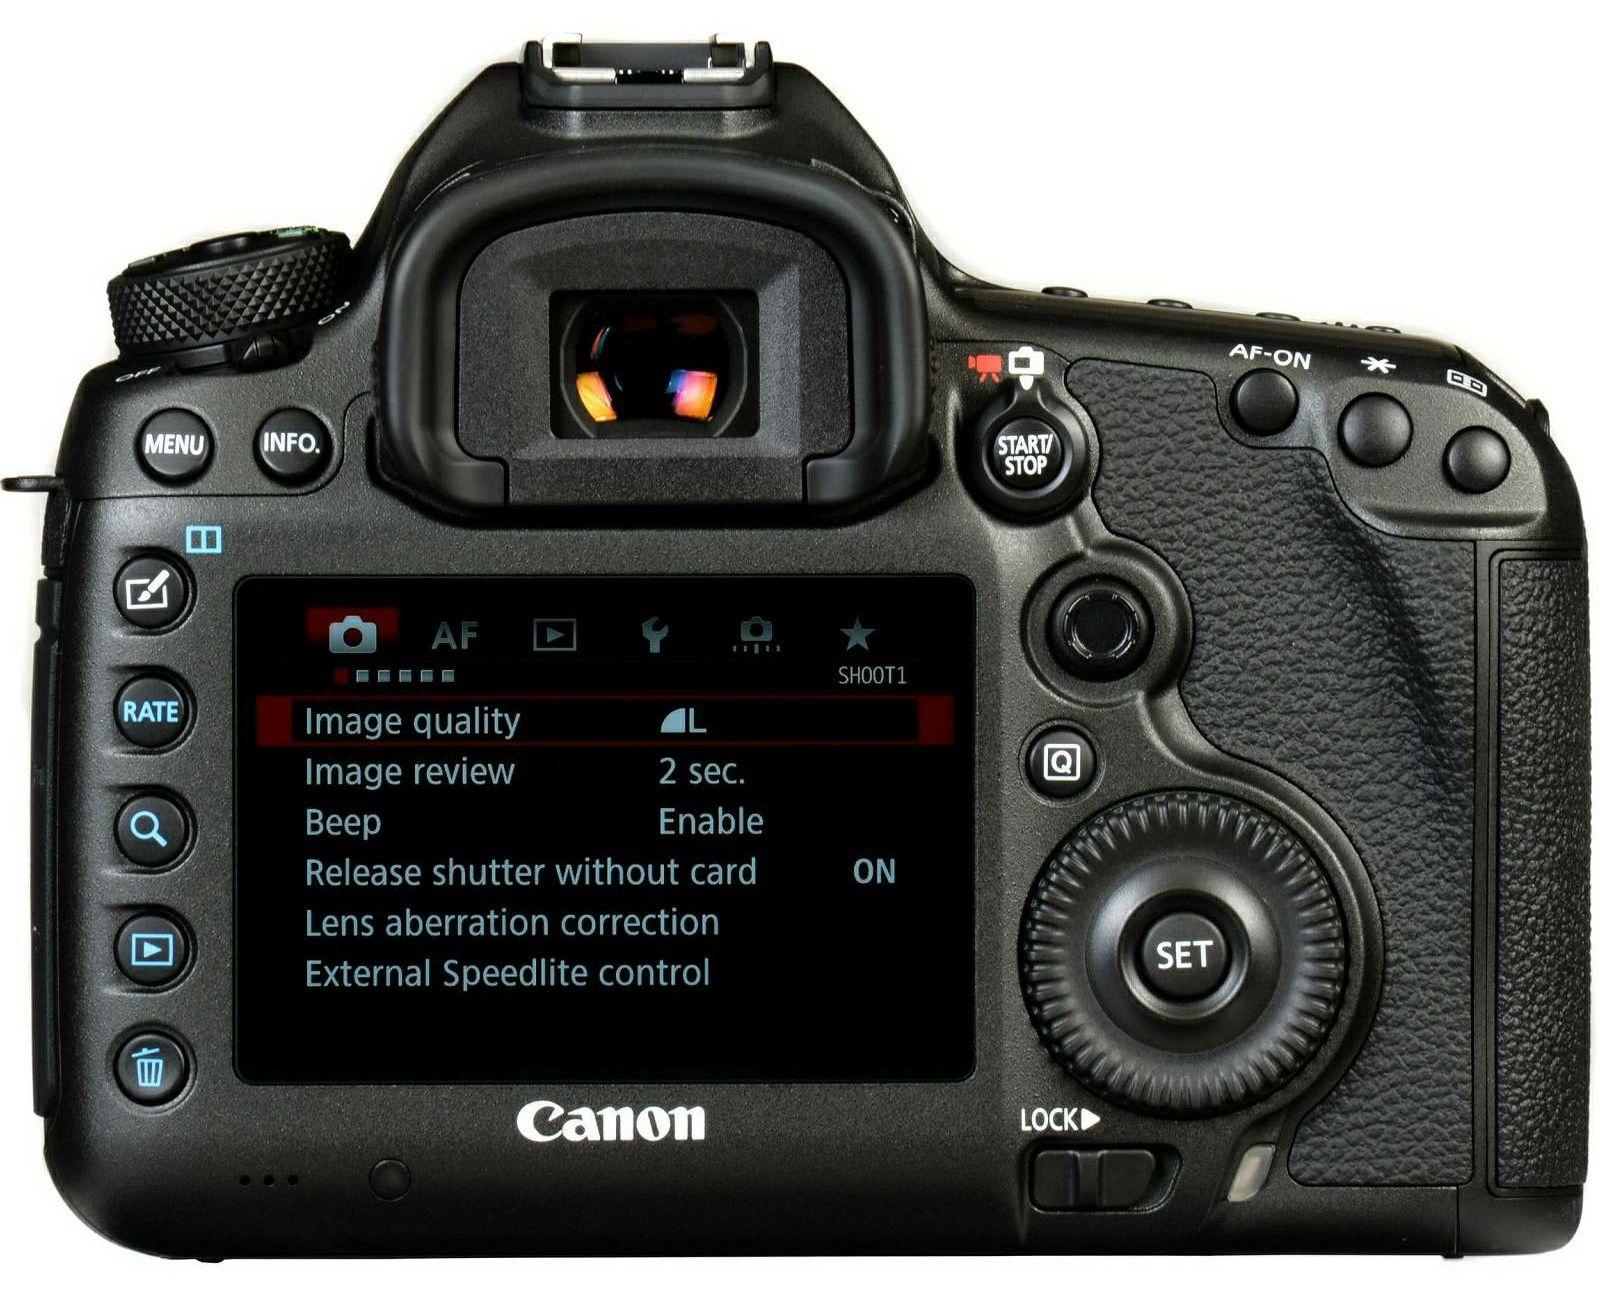 Canon EOS 5Ds R Body DSLR digitalni fotoaparat 5Dsr (0582C004AA) - CASH  BACK promocija povrat novca u iznosu 1500 kn